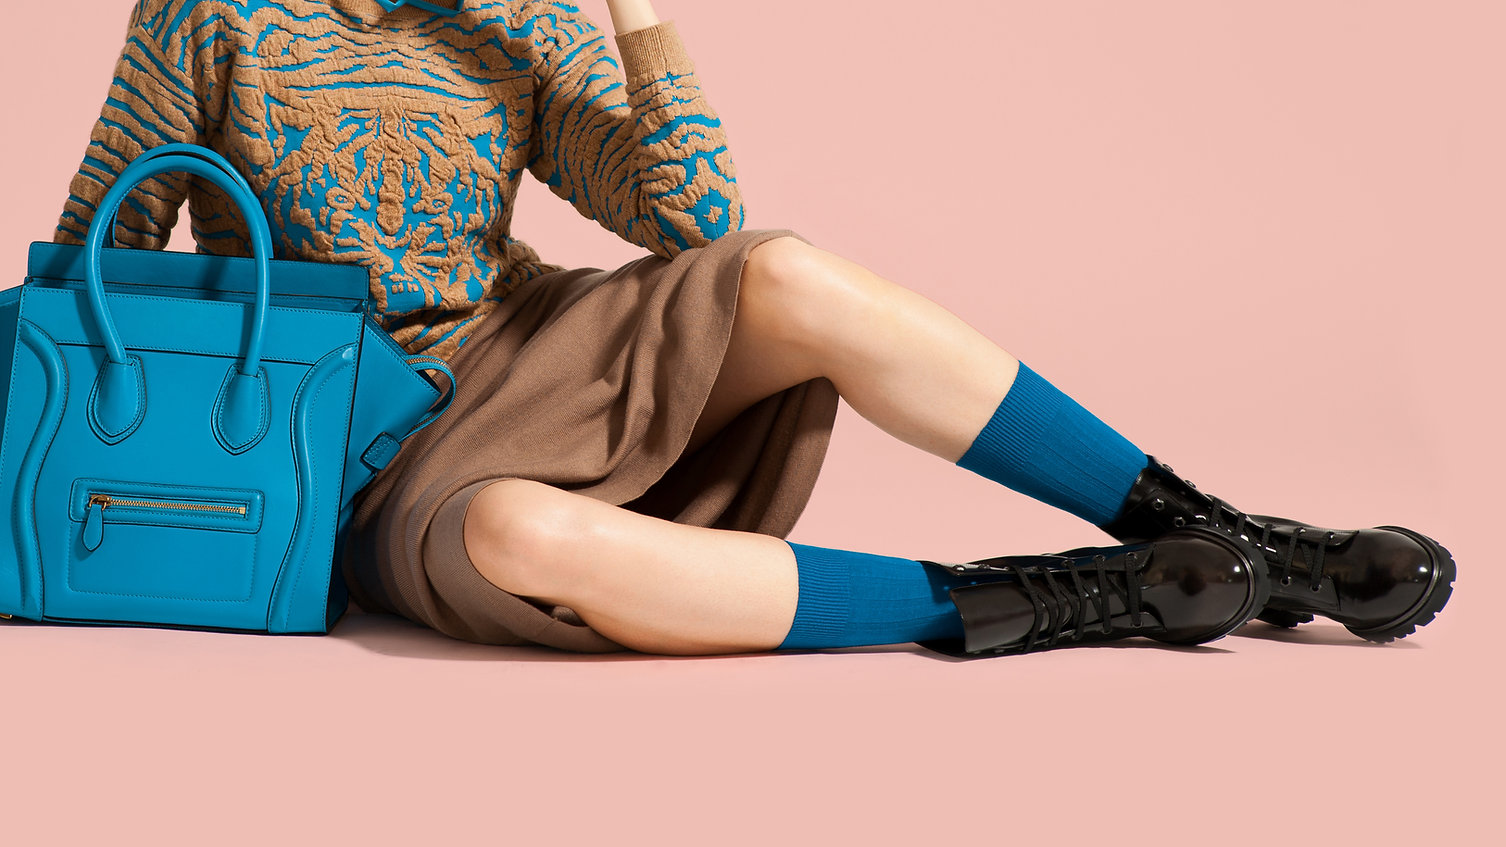 zapatos negros calcetines azules